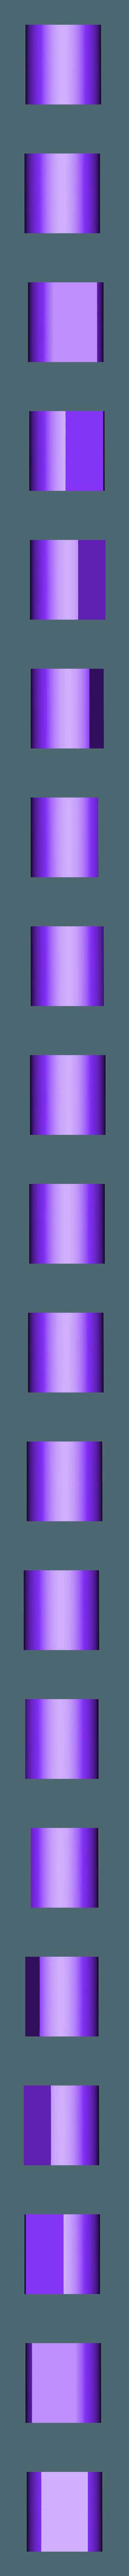 Bottom_Barrell_Plug2.stl Télécharger fichier STL gratuit Borderlands Bandit Room Clener Shotgun • Modèle pour impression 3D, Dsk